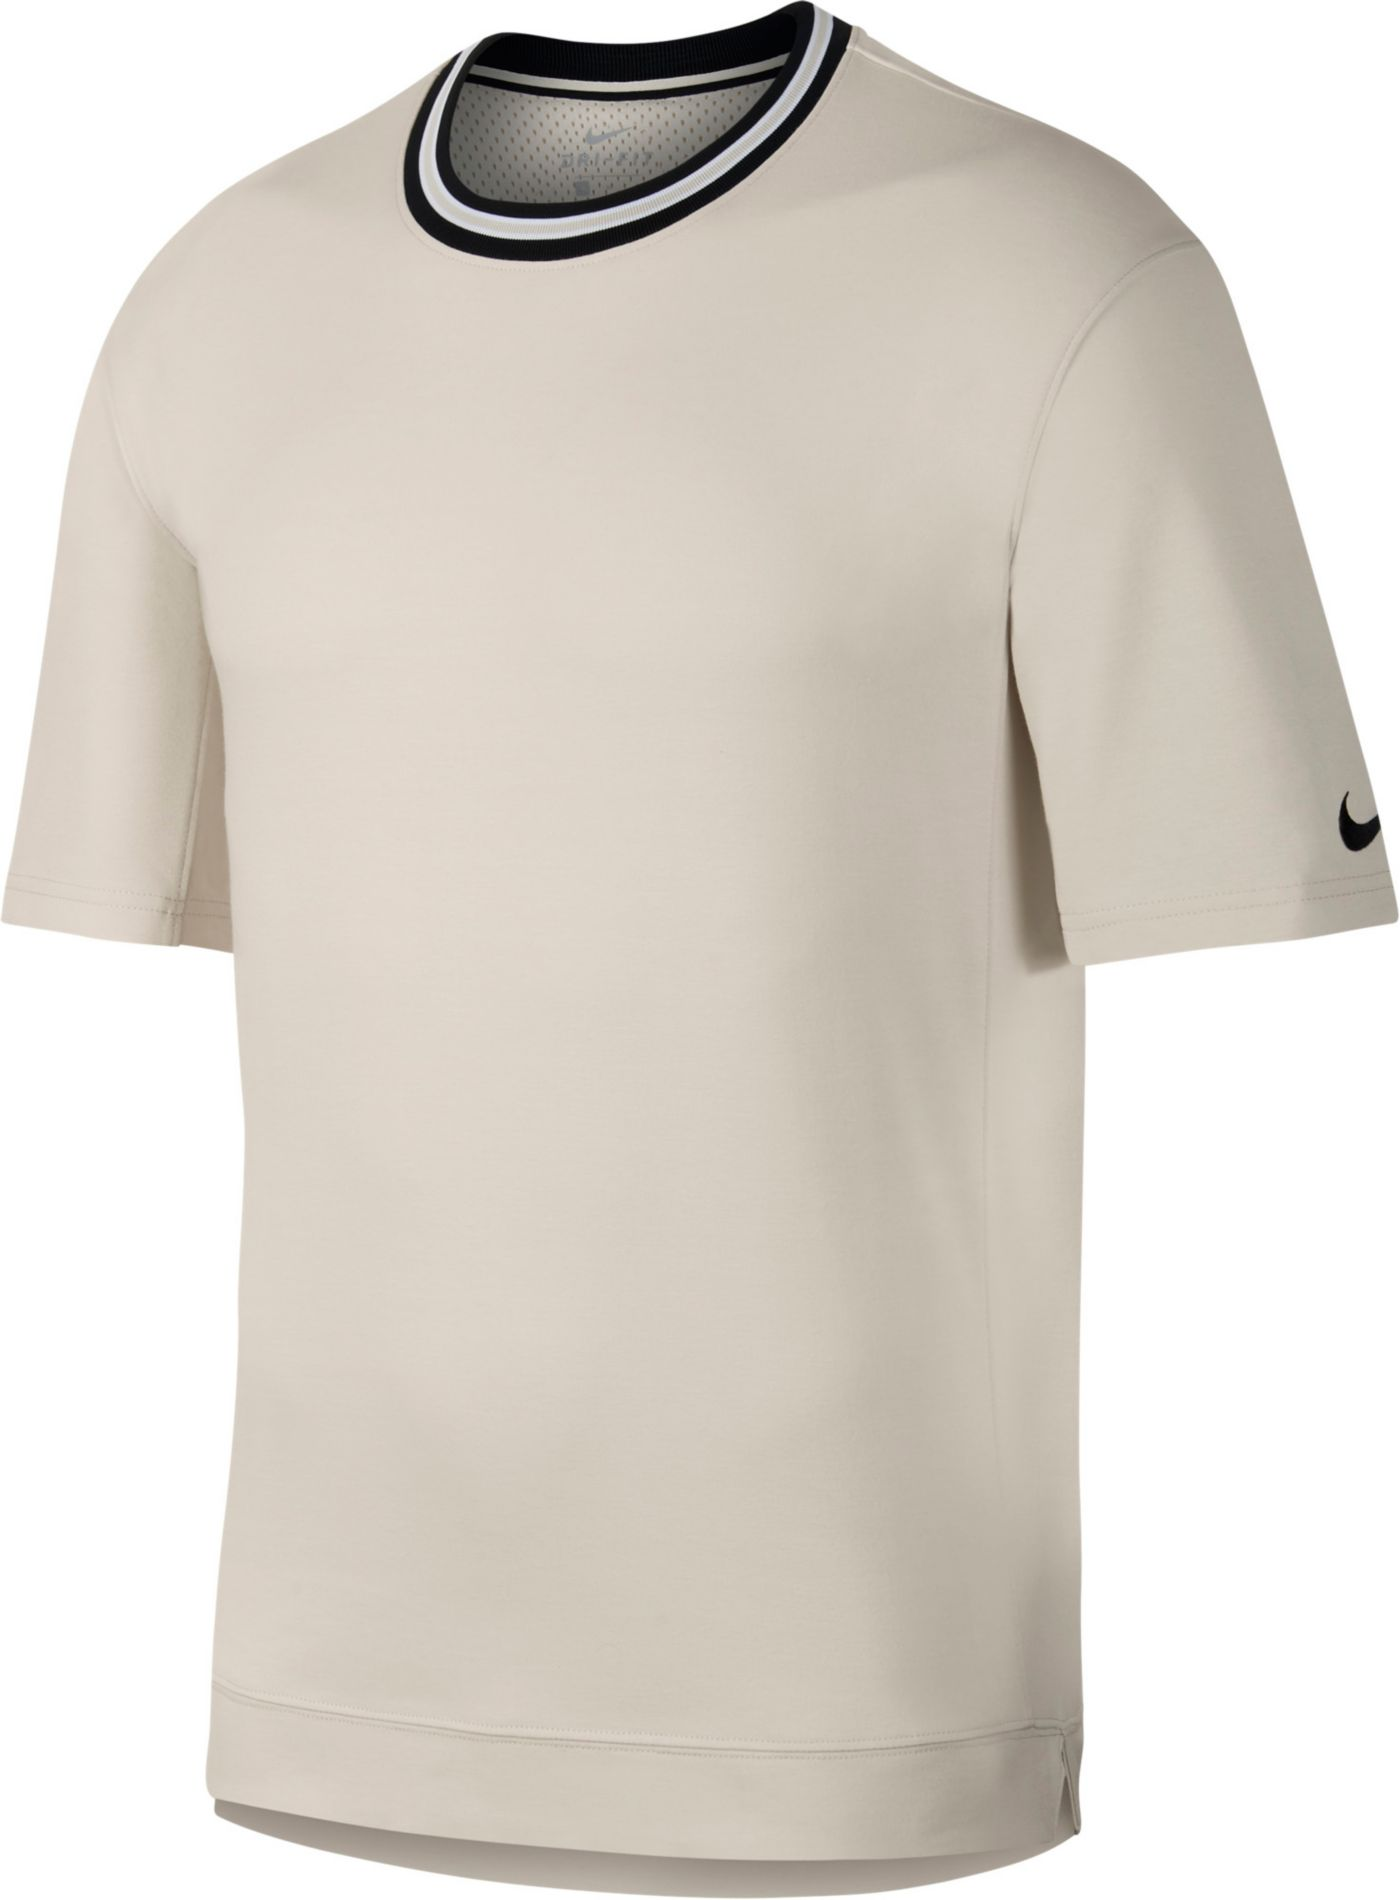 Nike Men's Dry HoopXFly T-Shirt